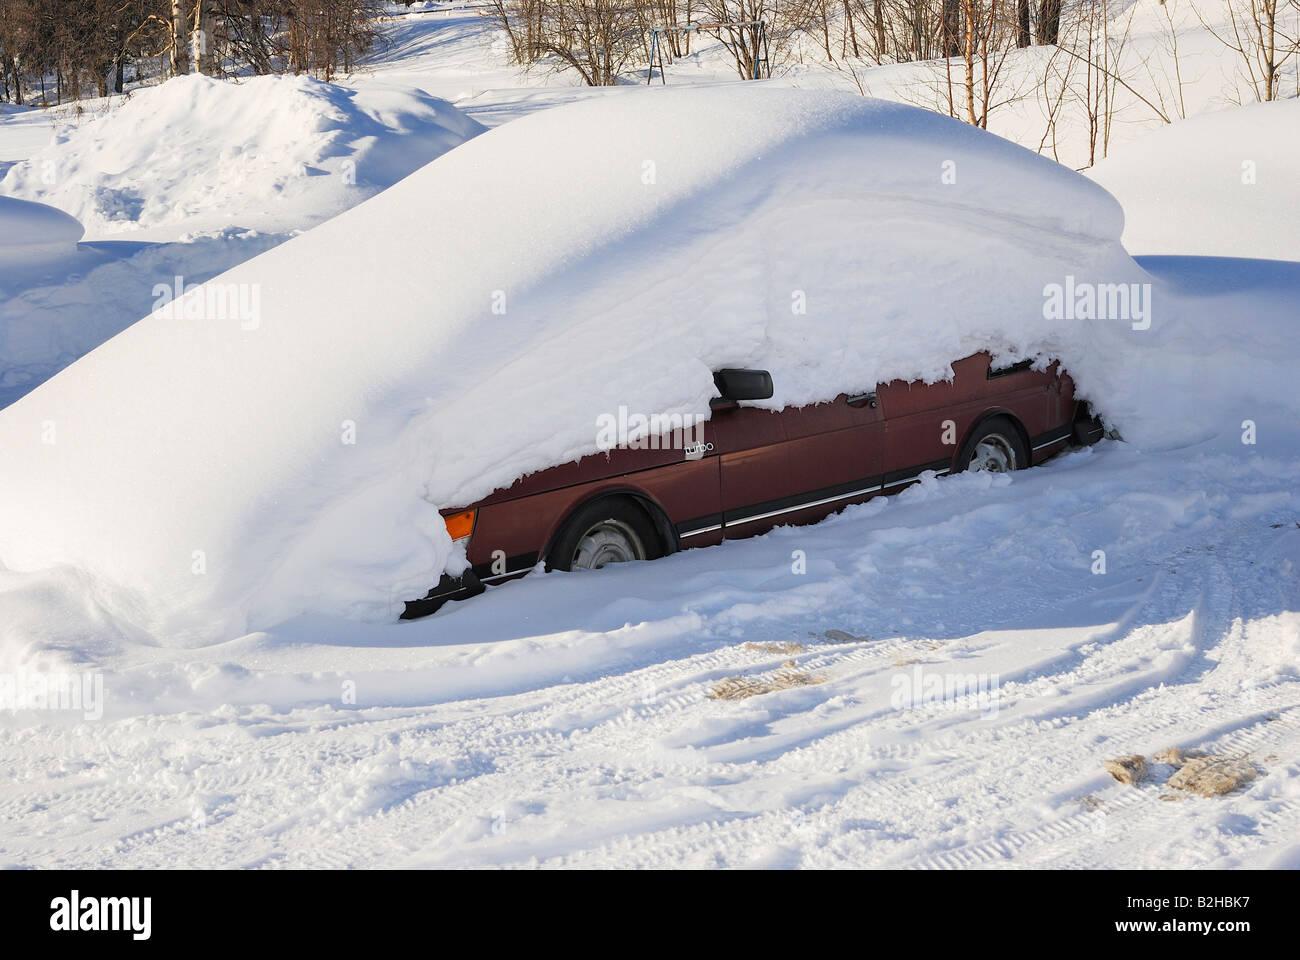 snowy snow covered car  Saab Turbo Gaellivare Lapland Sweden - Stock Image